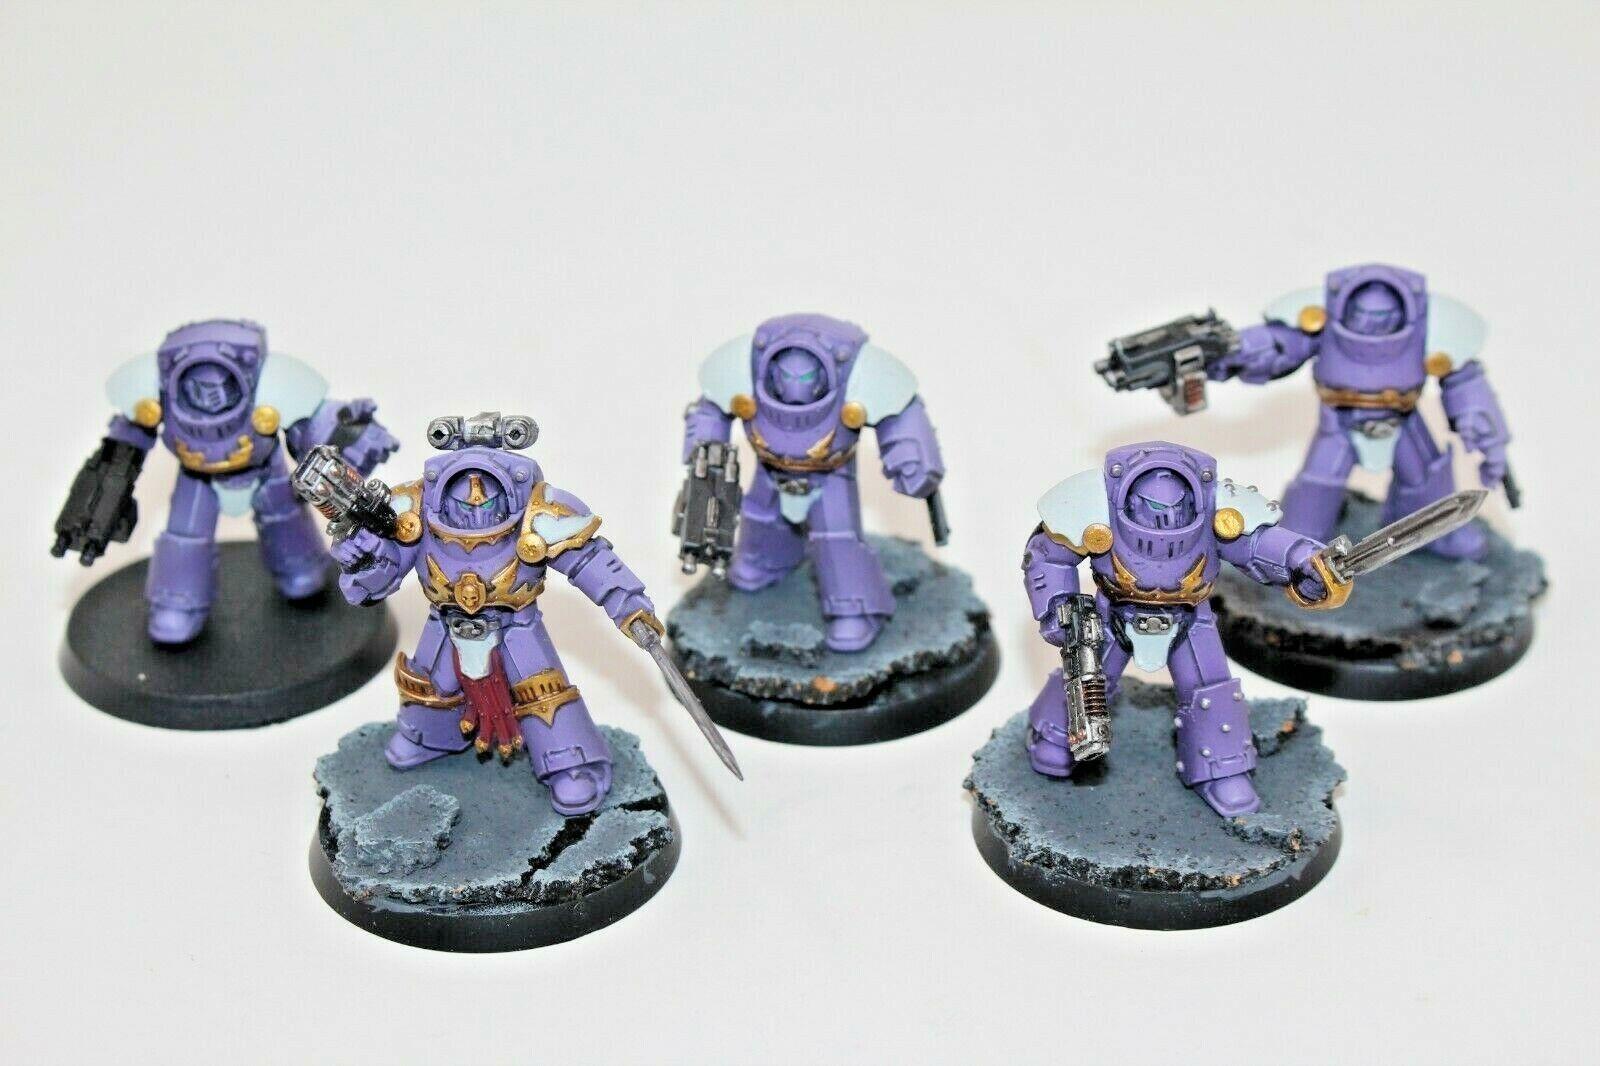 Warhammer Chaos Space Marines Tartaros Terminators Well Painted - JYS83